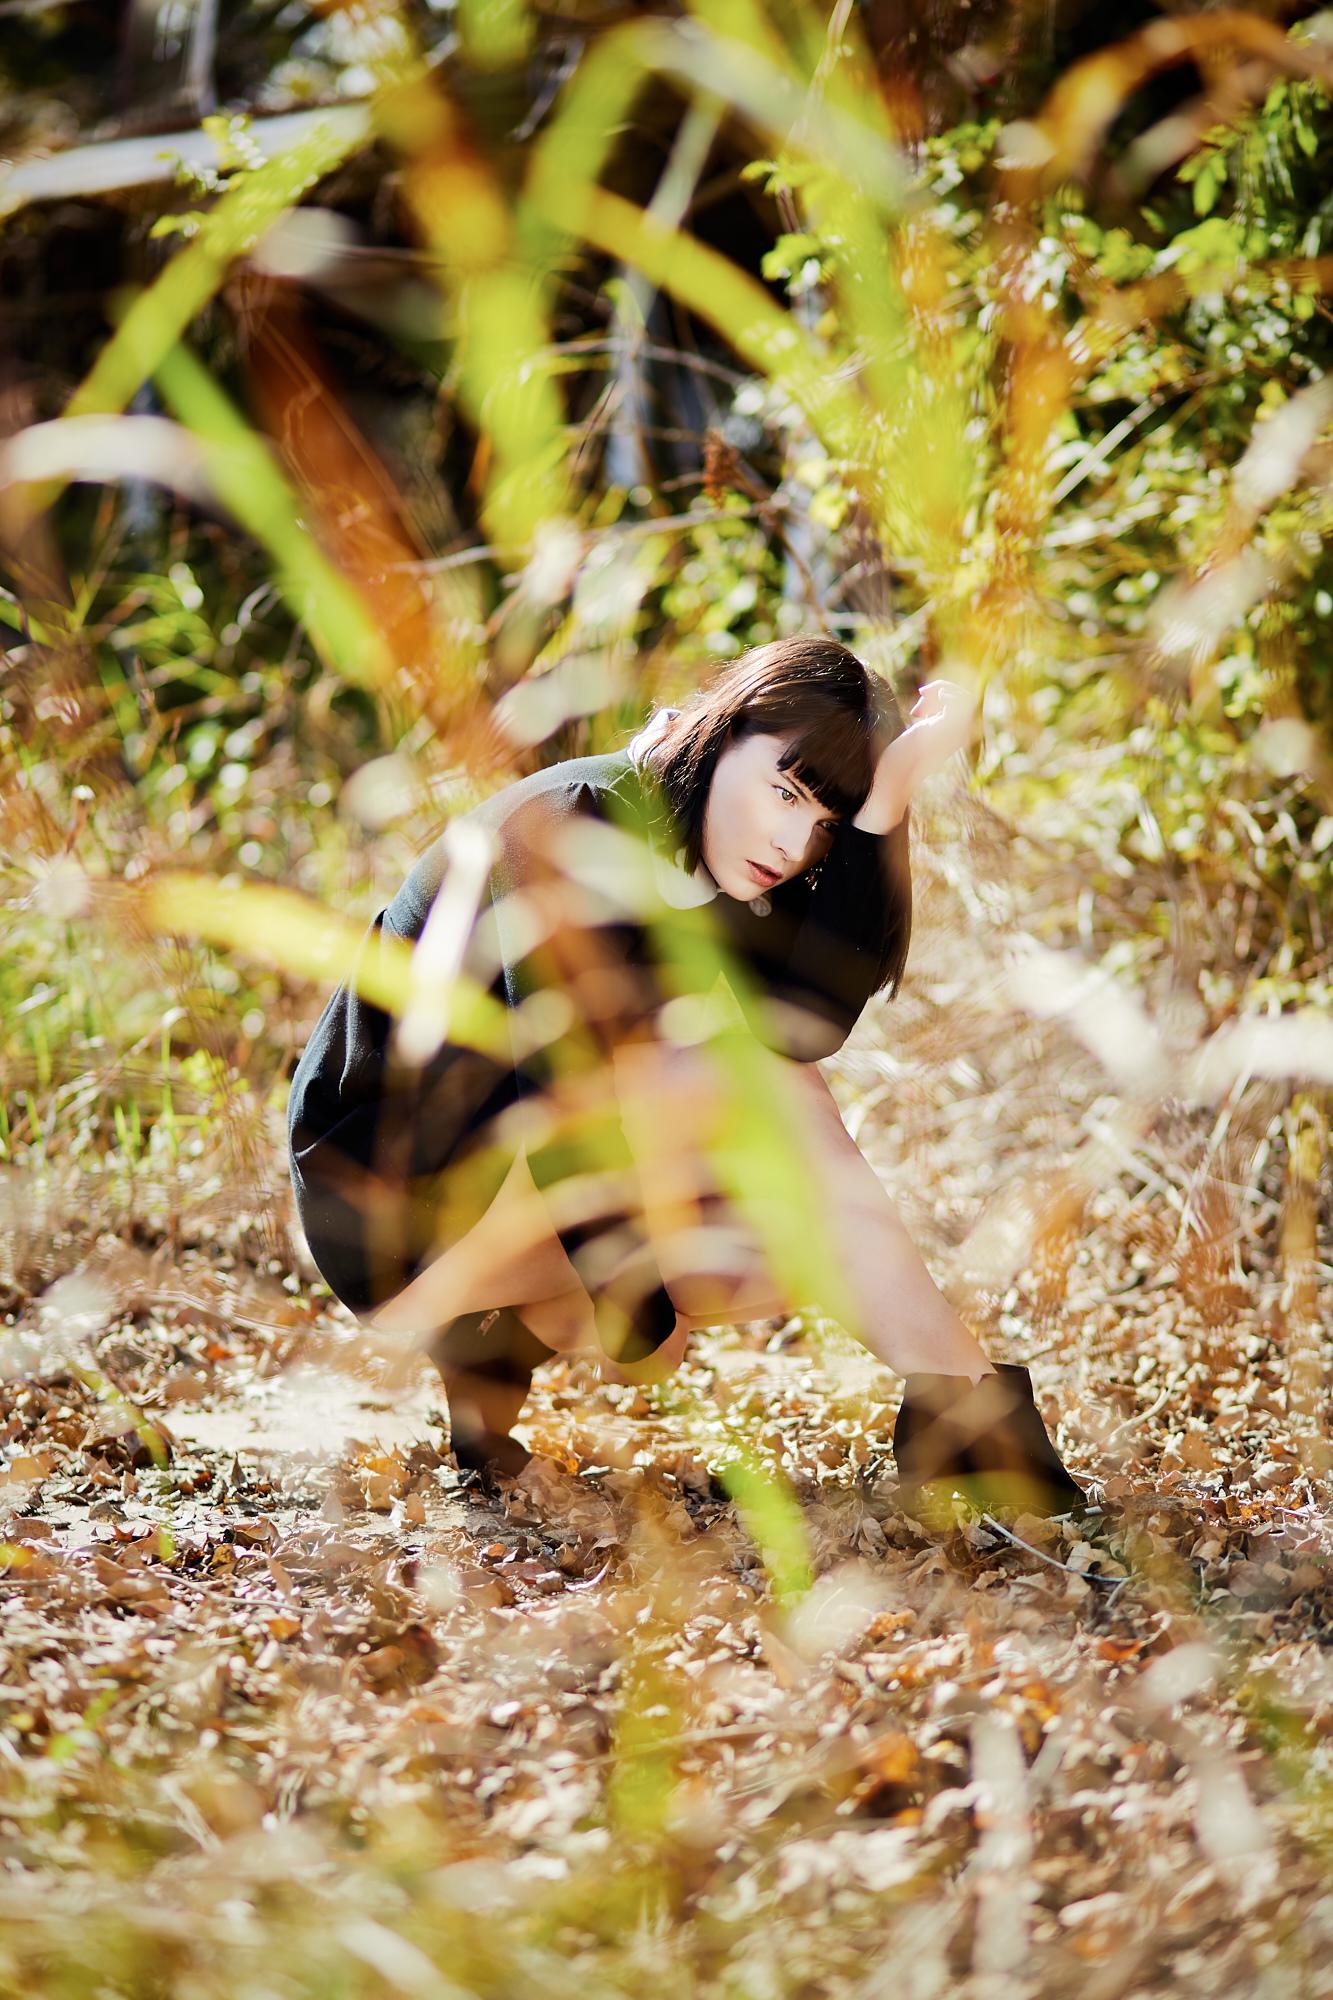 Taylor - Nick Knight Fashion